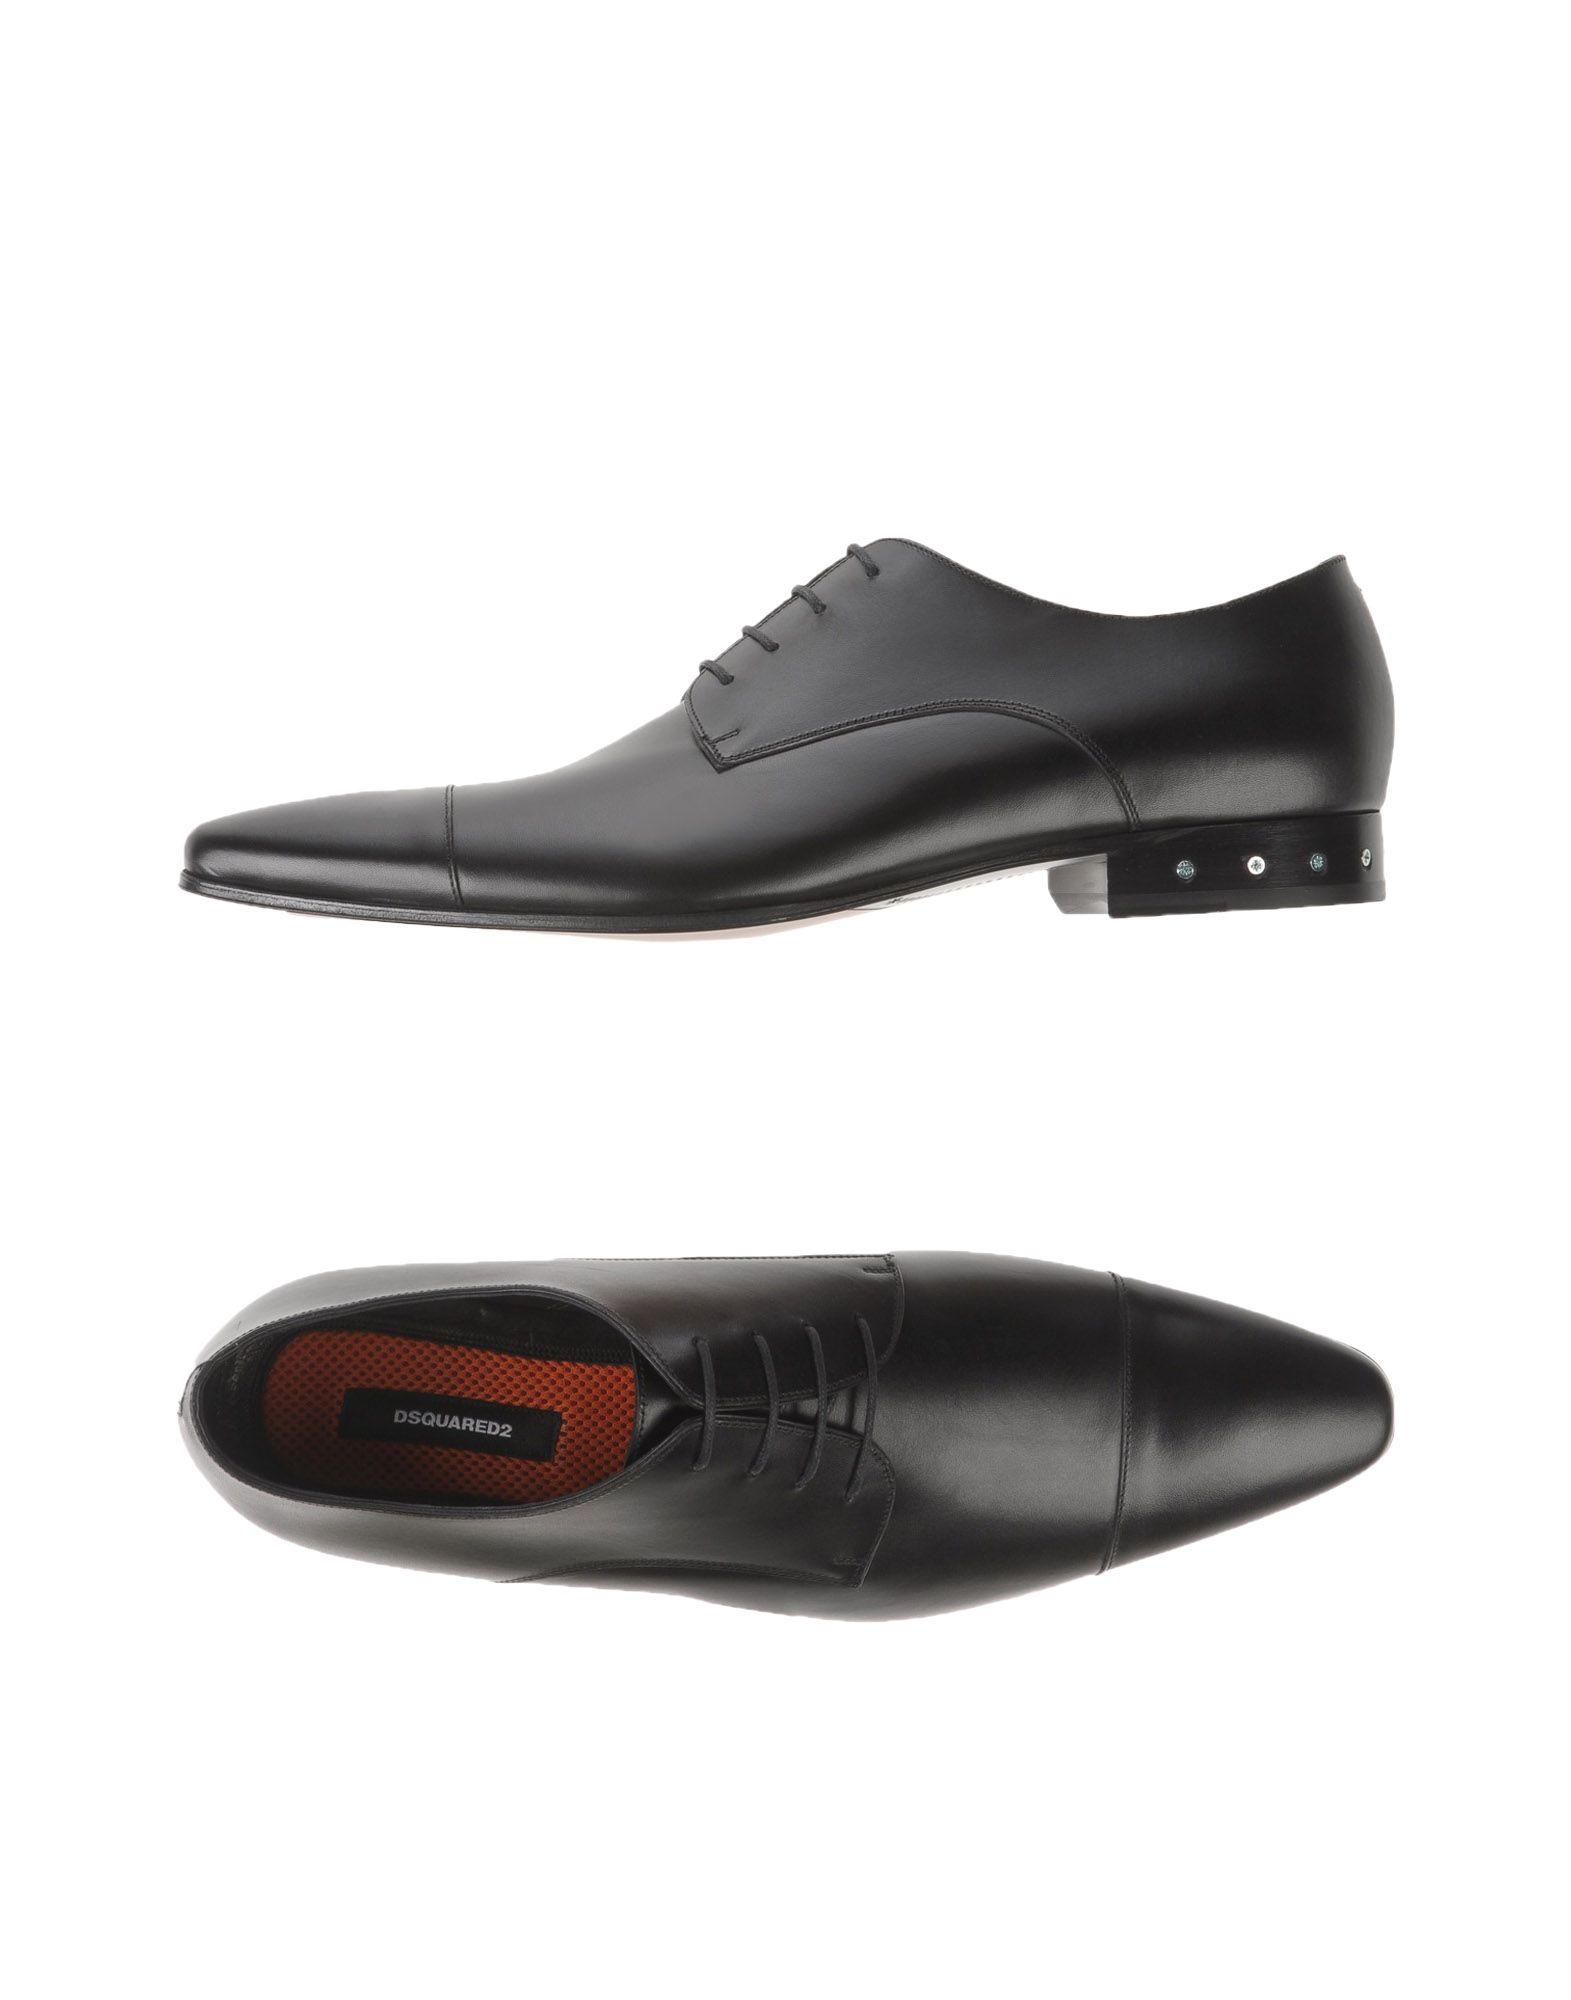 Chaussures À Lacets Dsquared2 Femme - Chaussures À Lacets Dsquared2 sur